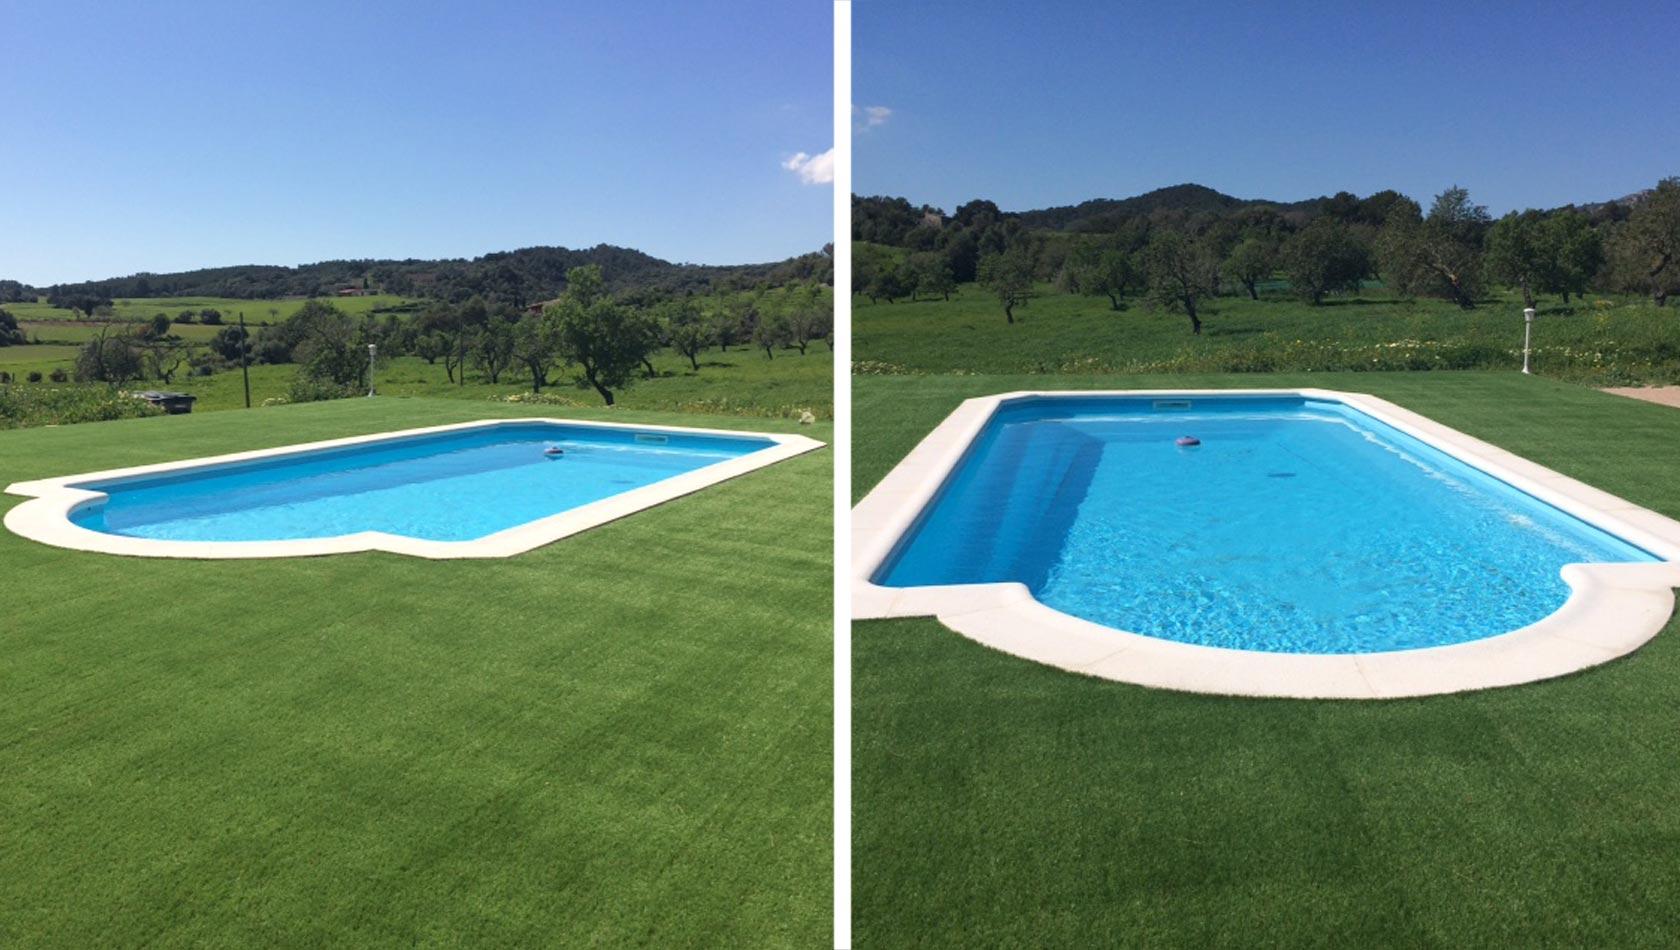 Piscinas for Multiforma piscinas